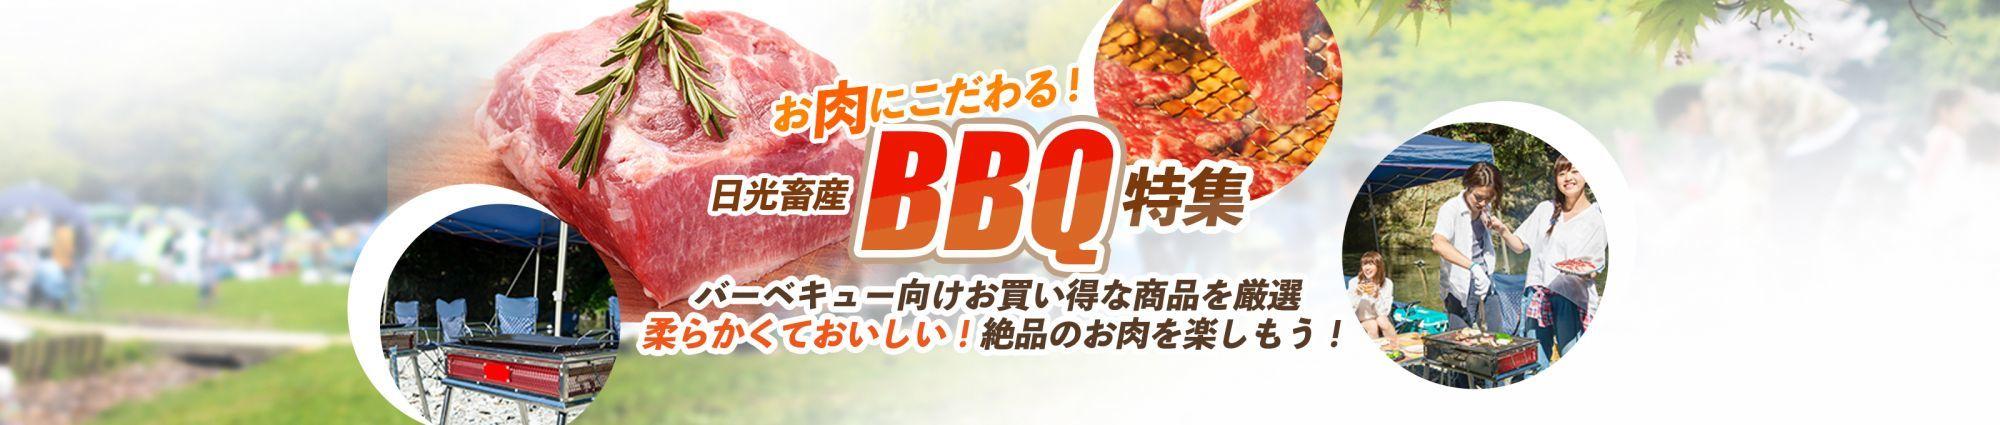 BBQ用厳選お肉特集(春夏)